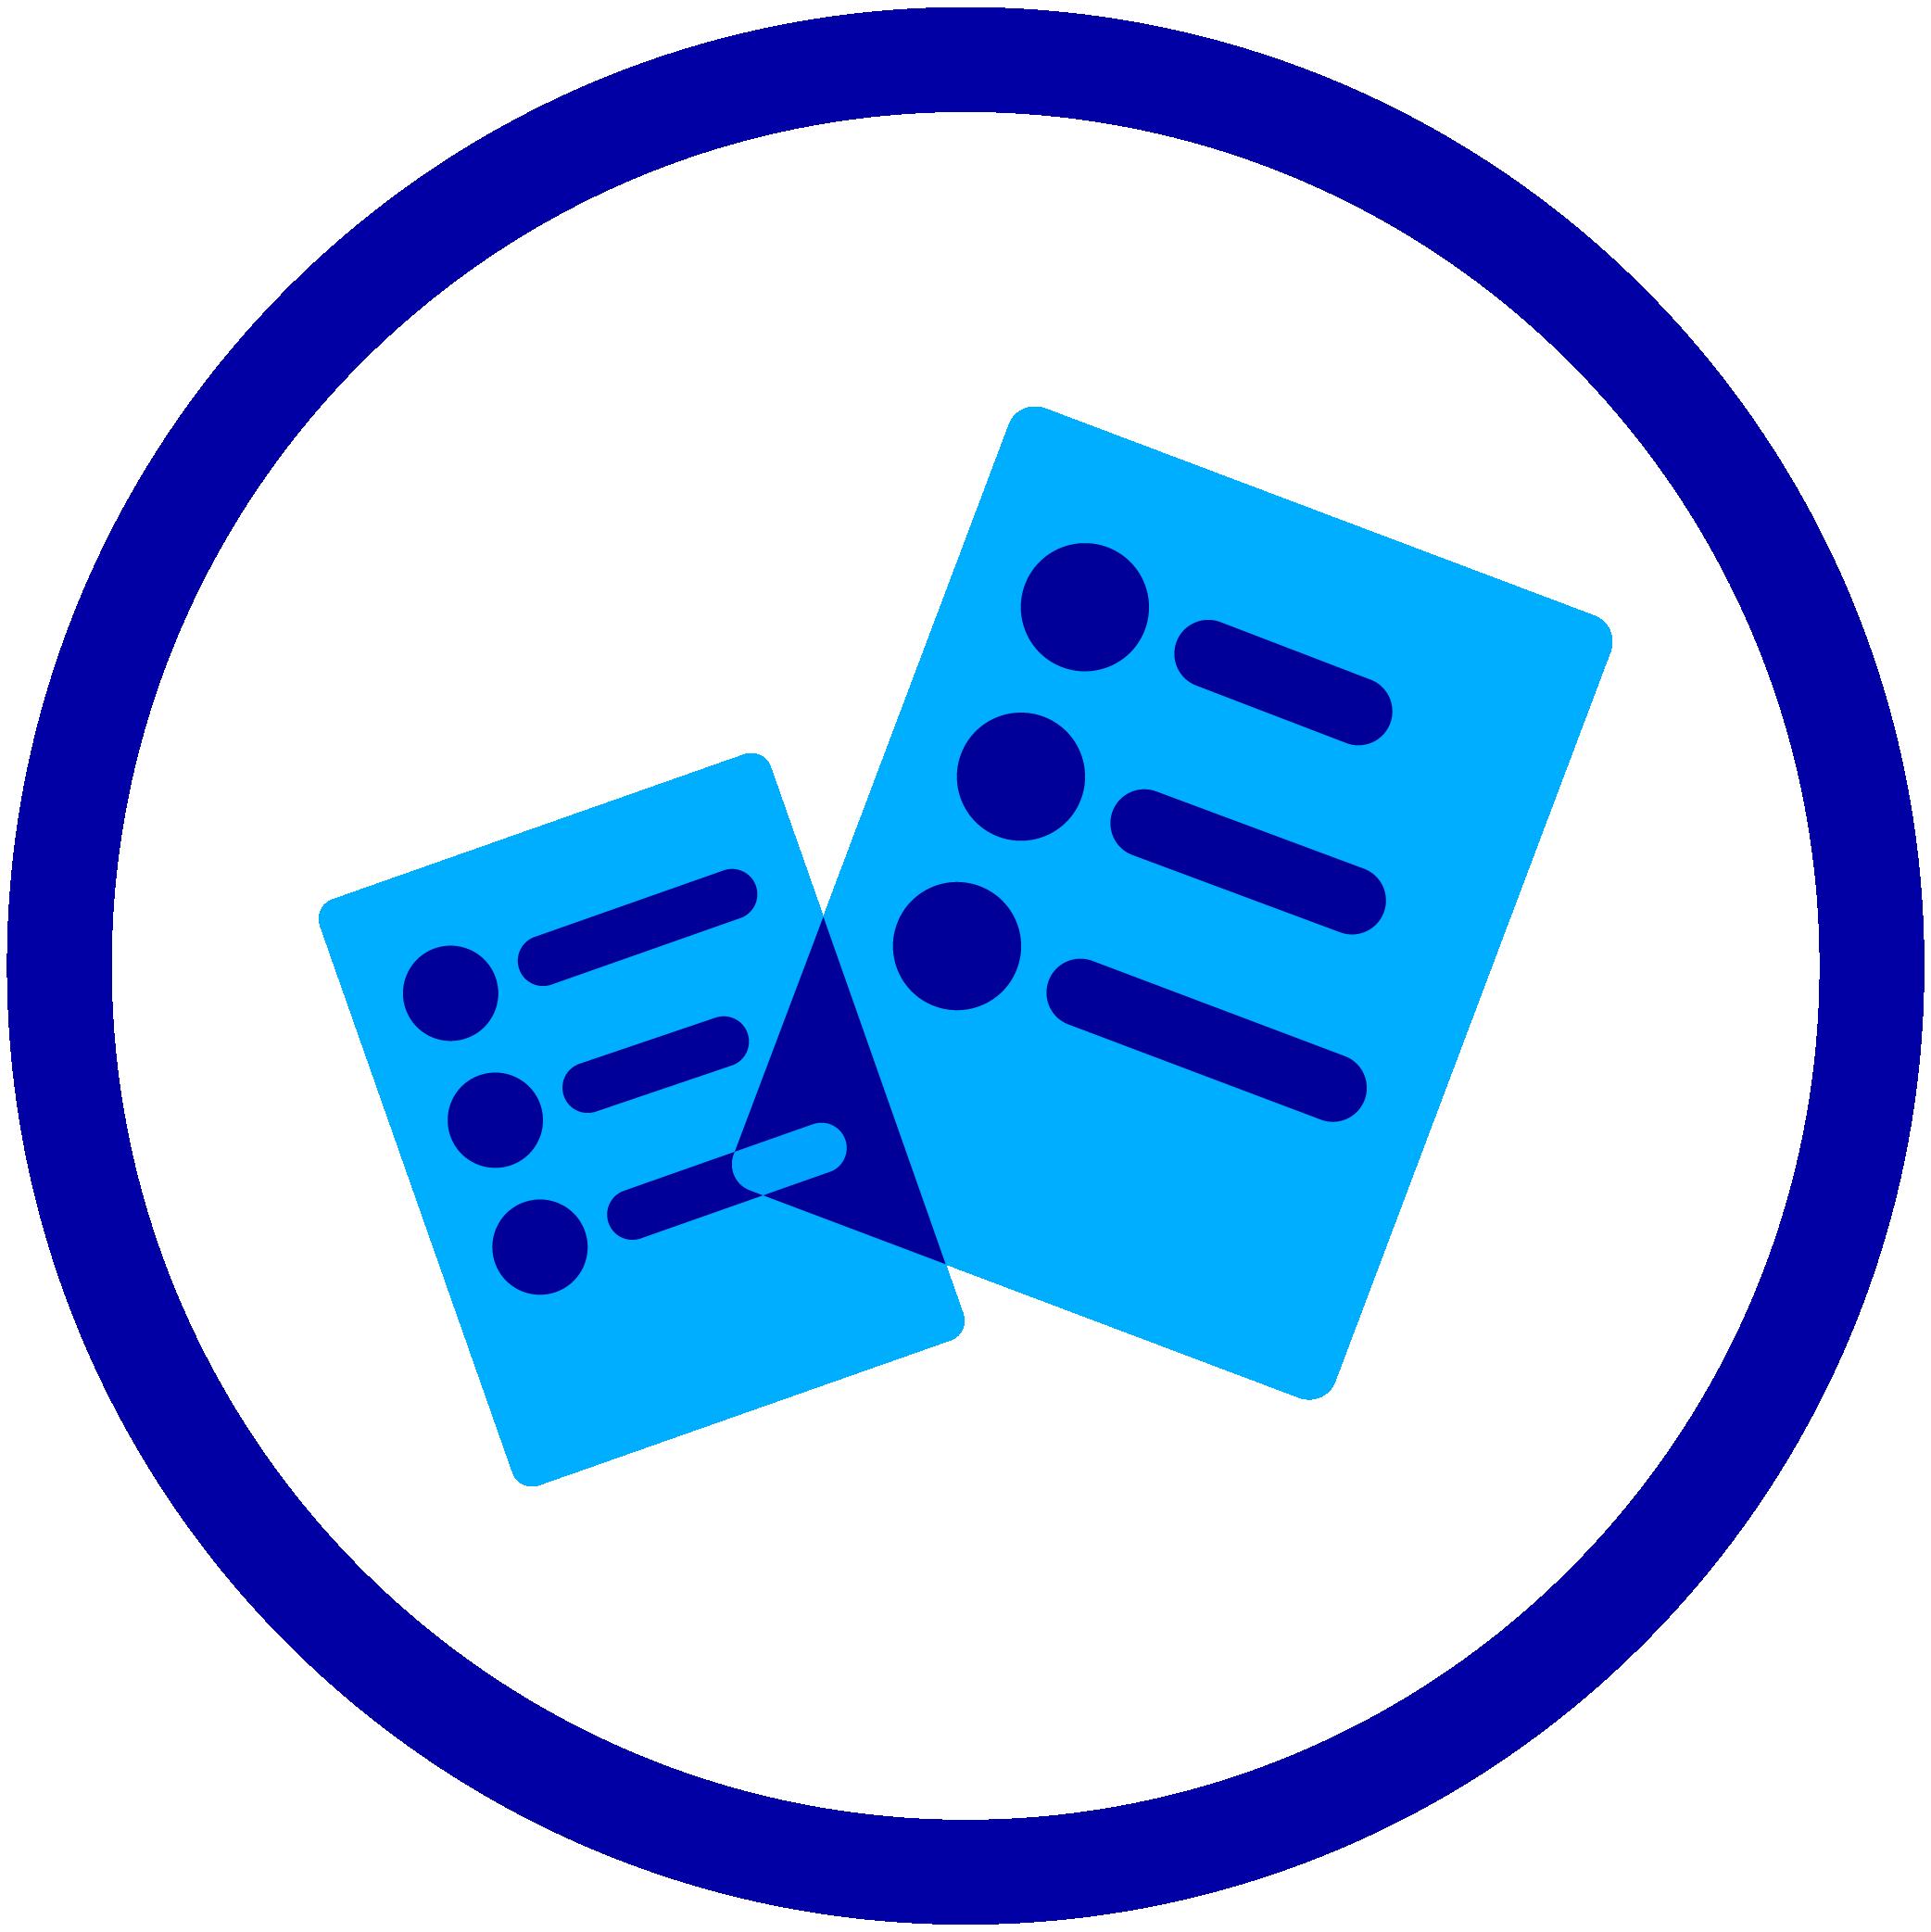 https://jp.fi-group.com/wp-content/uploads/sites/18/2021/09/blue-icons-set_1-07.png